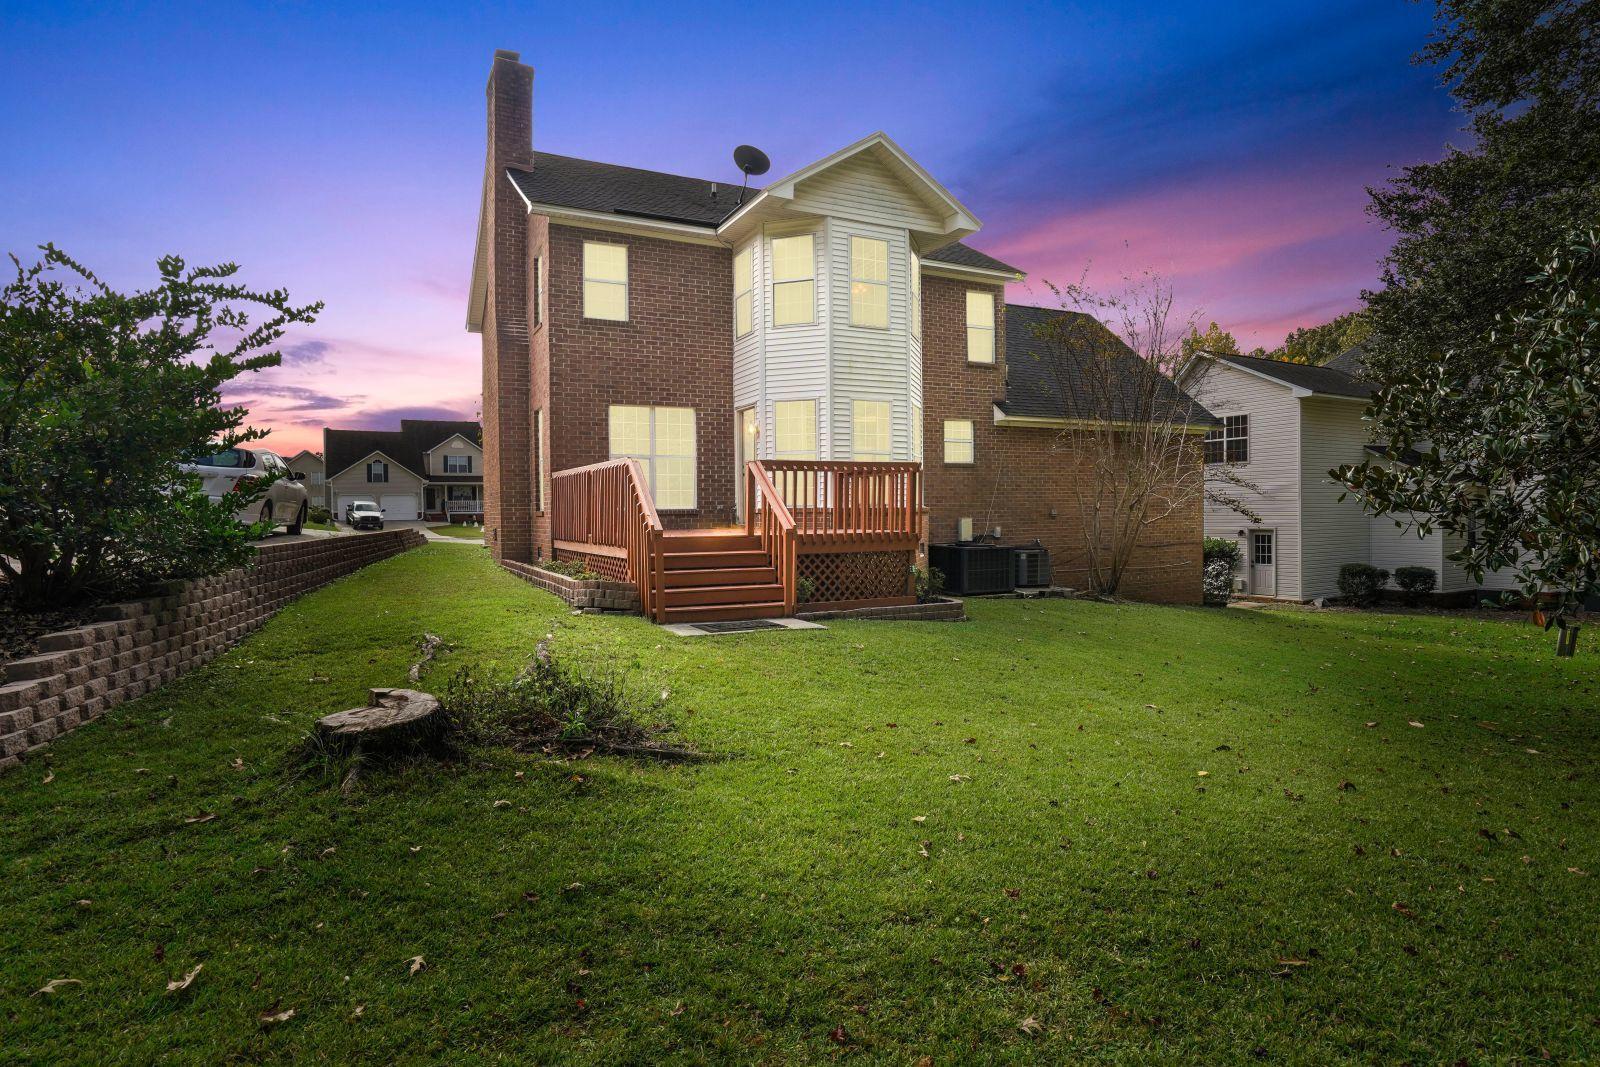 Crowfield Plantation Homes For Sale - 161 Belleplaine, Goose Creek, SC - 1